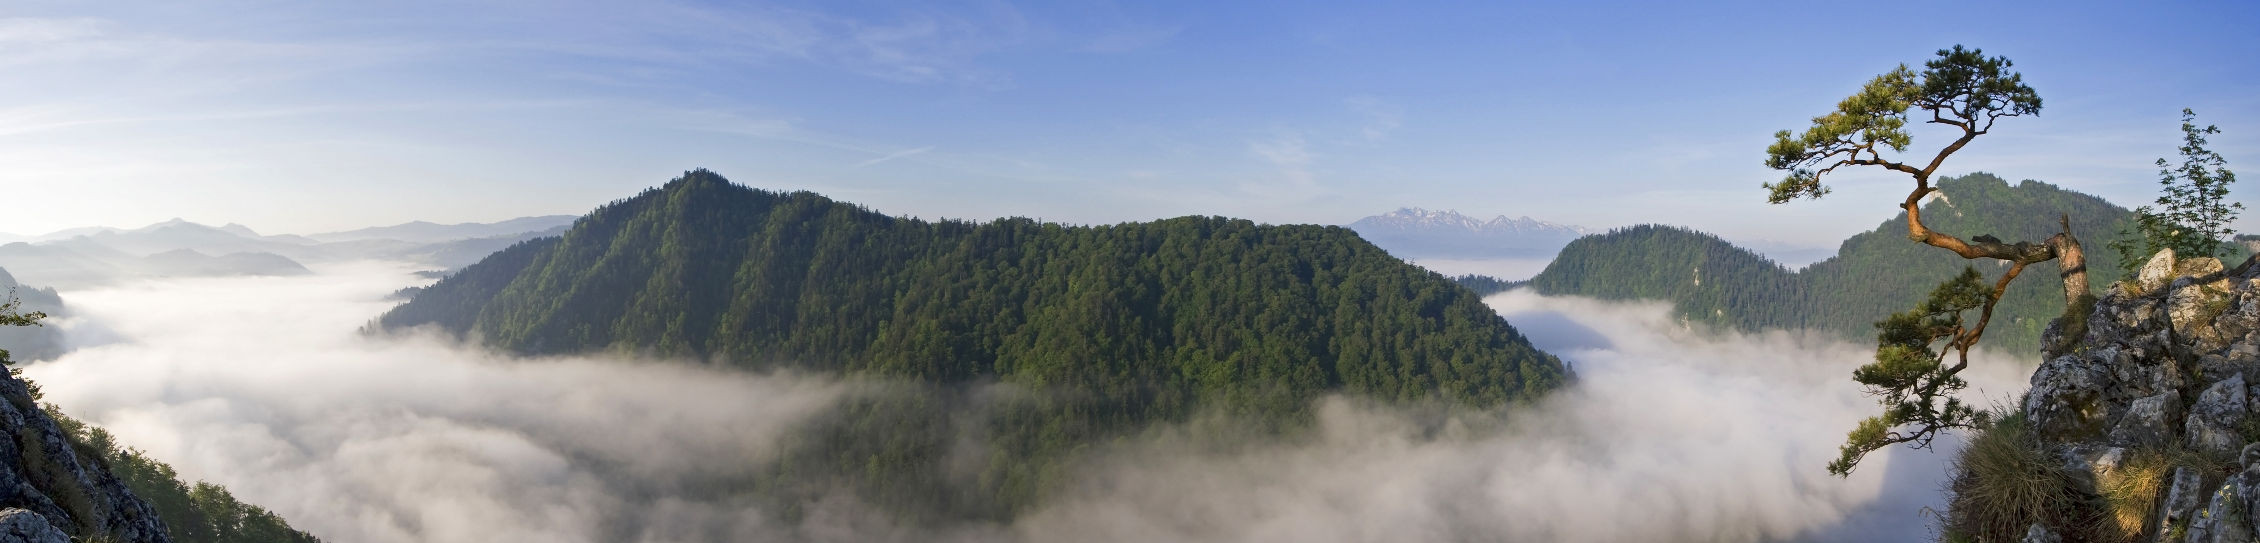 Ochrona przyrody – Natura 2000